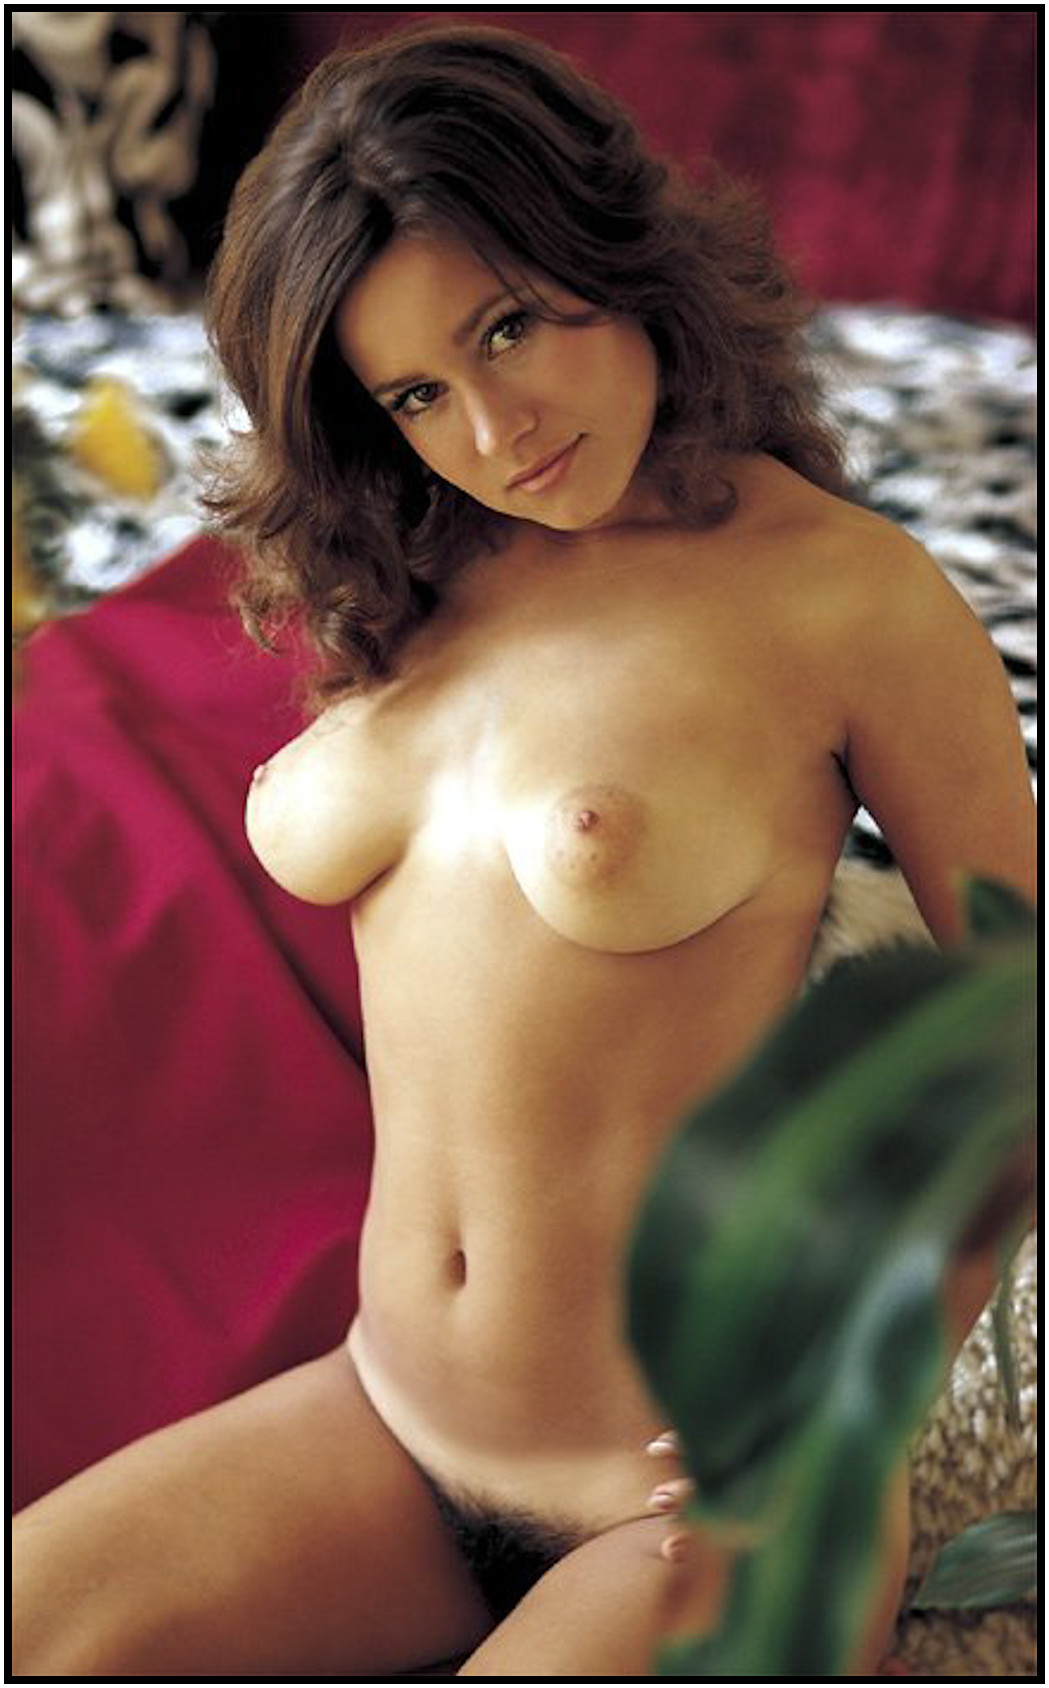 Jennifer widerstrom ifc bikini photos